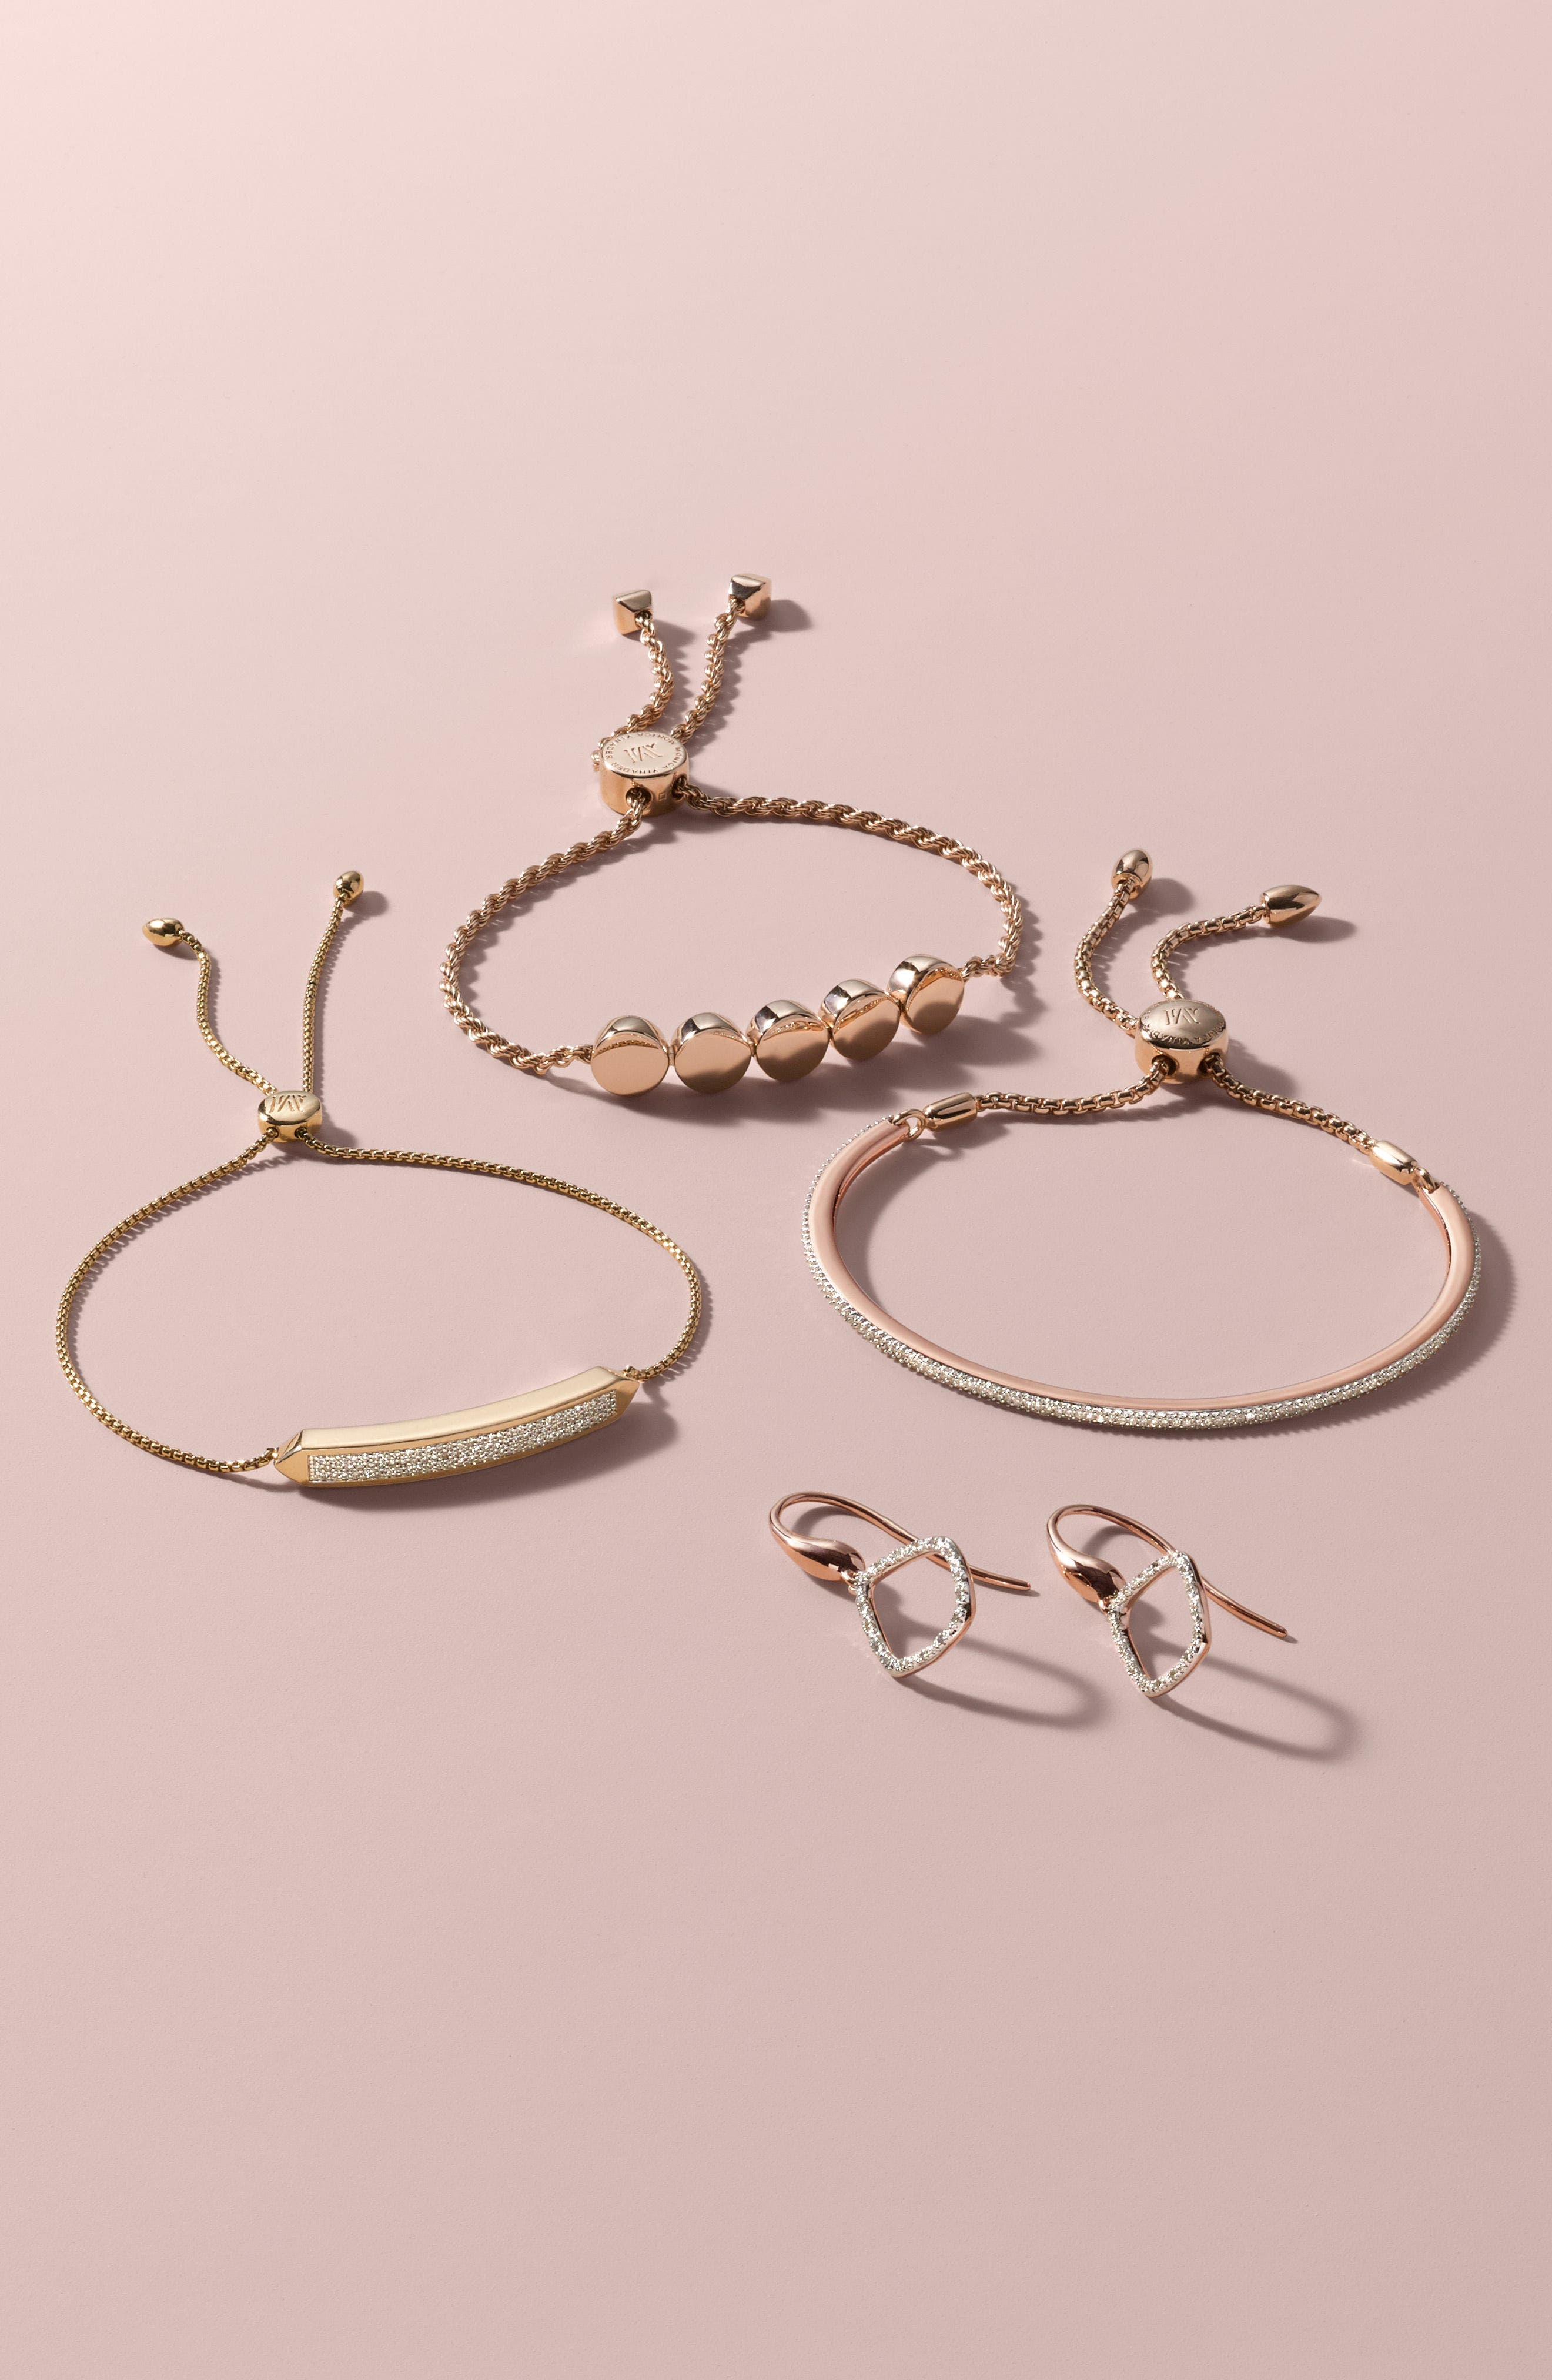 Baja Skinny Pavé Diamond Bracelet,                             Alternate thumbnail 4, color,                             SILVER